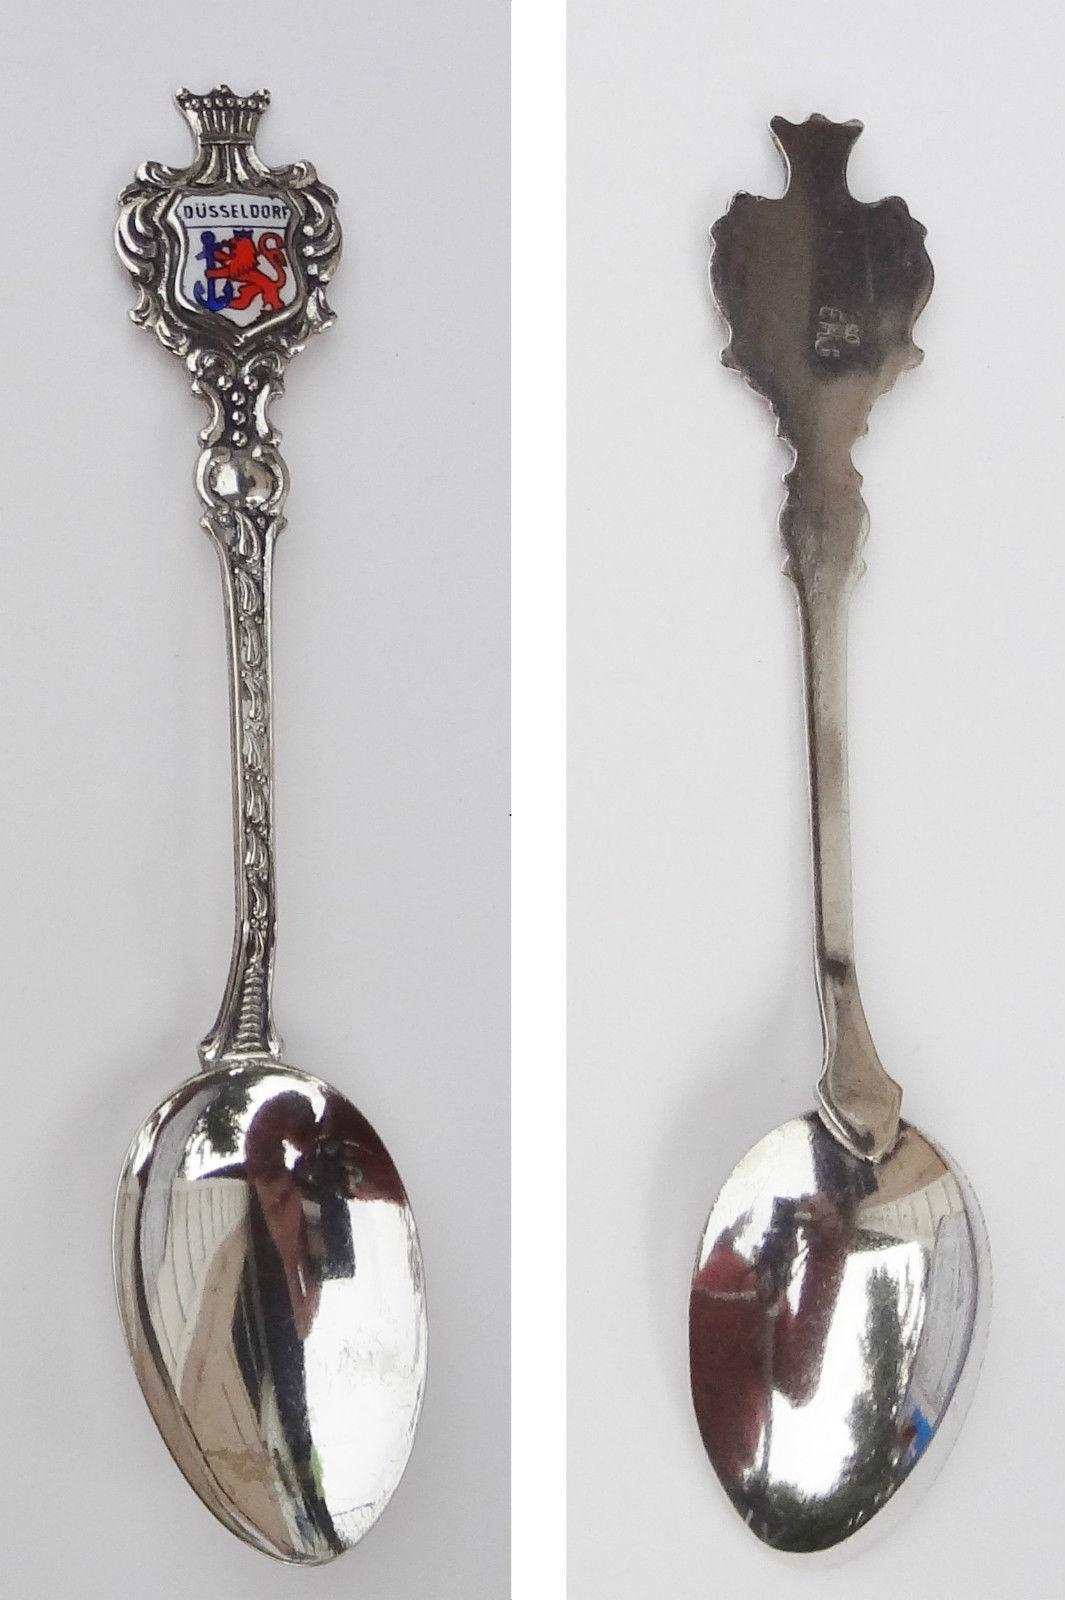 Collector Souvenir Spoon Germany Dusseldorf Coat of Arms